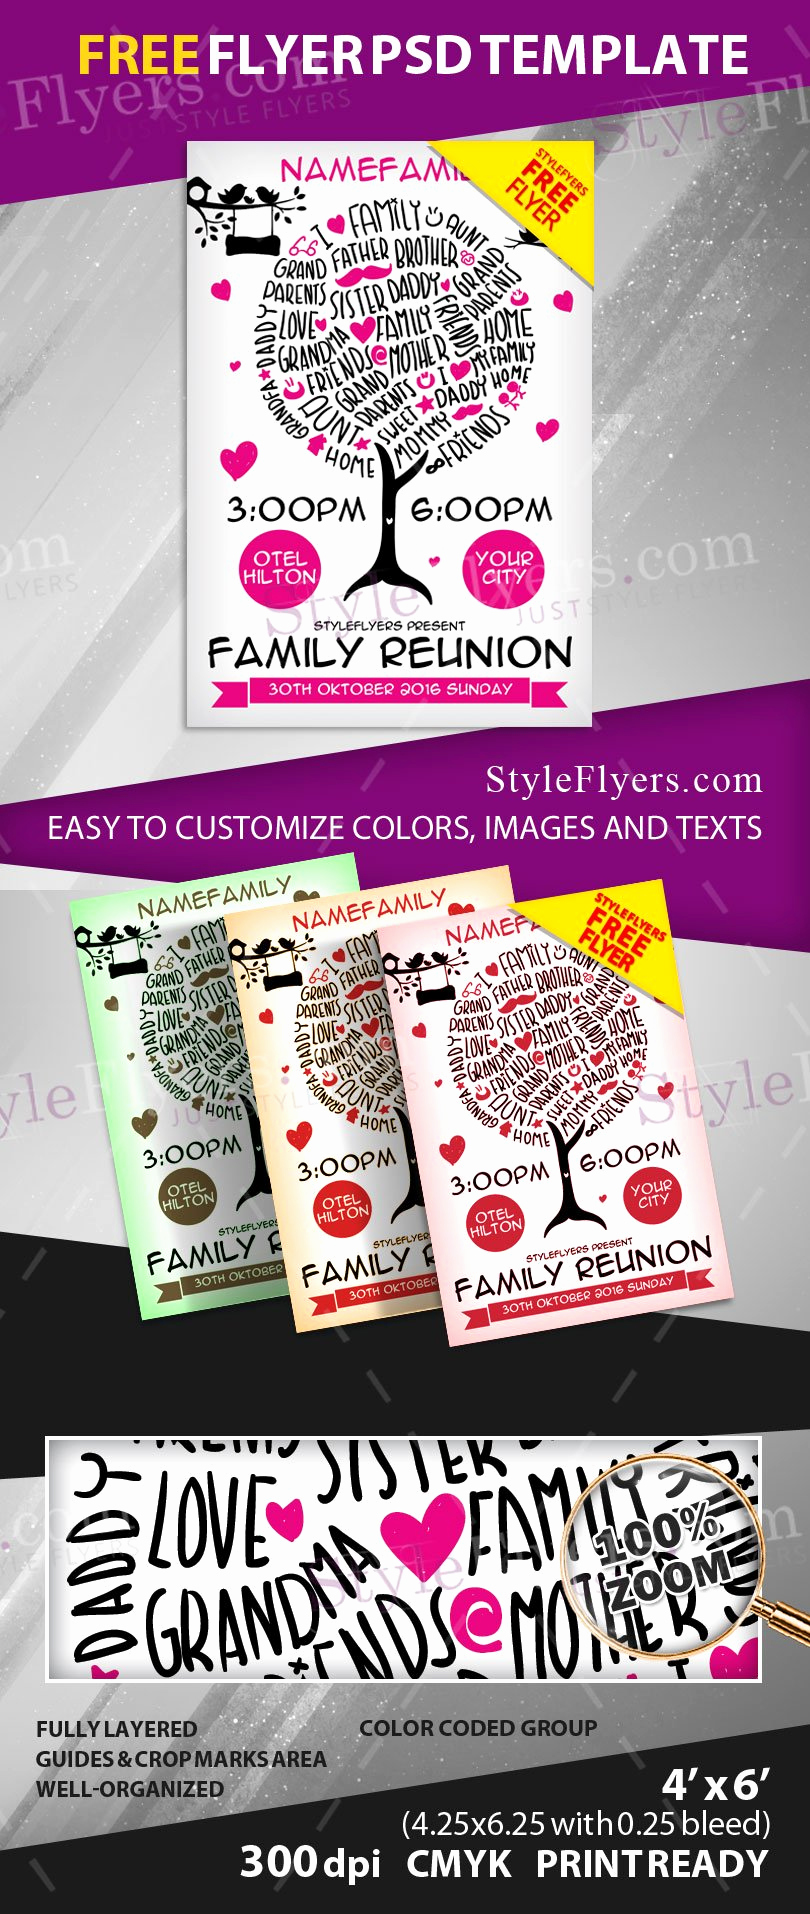 Family Reunion Flyers Templates Beautiful Family Reunion Free Psd Flyer Template Free Download